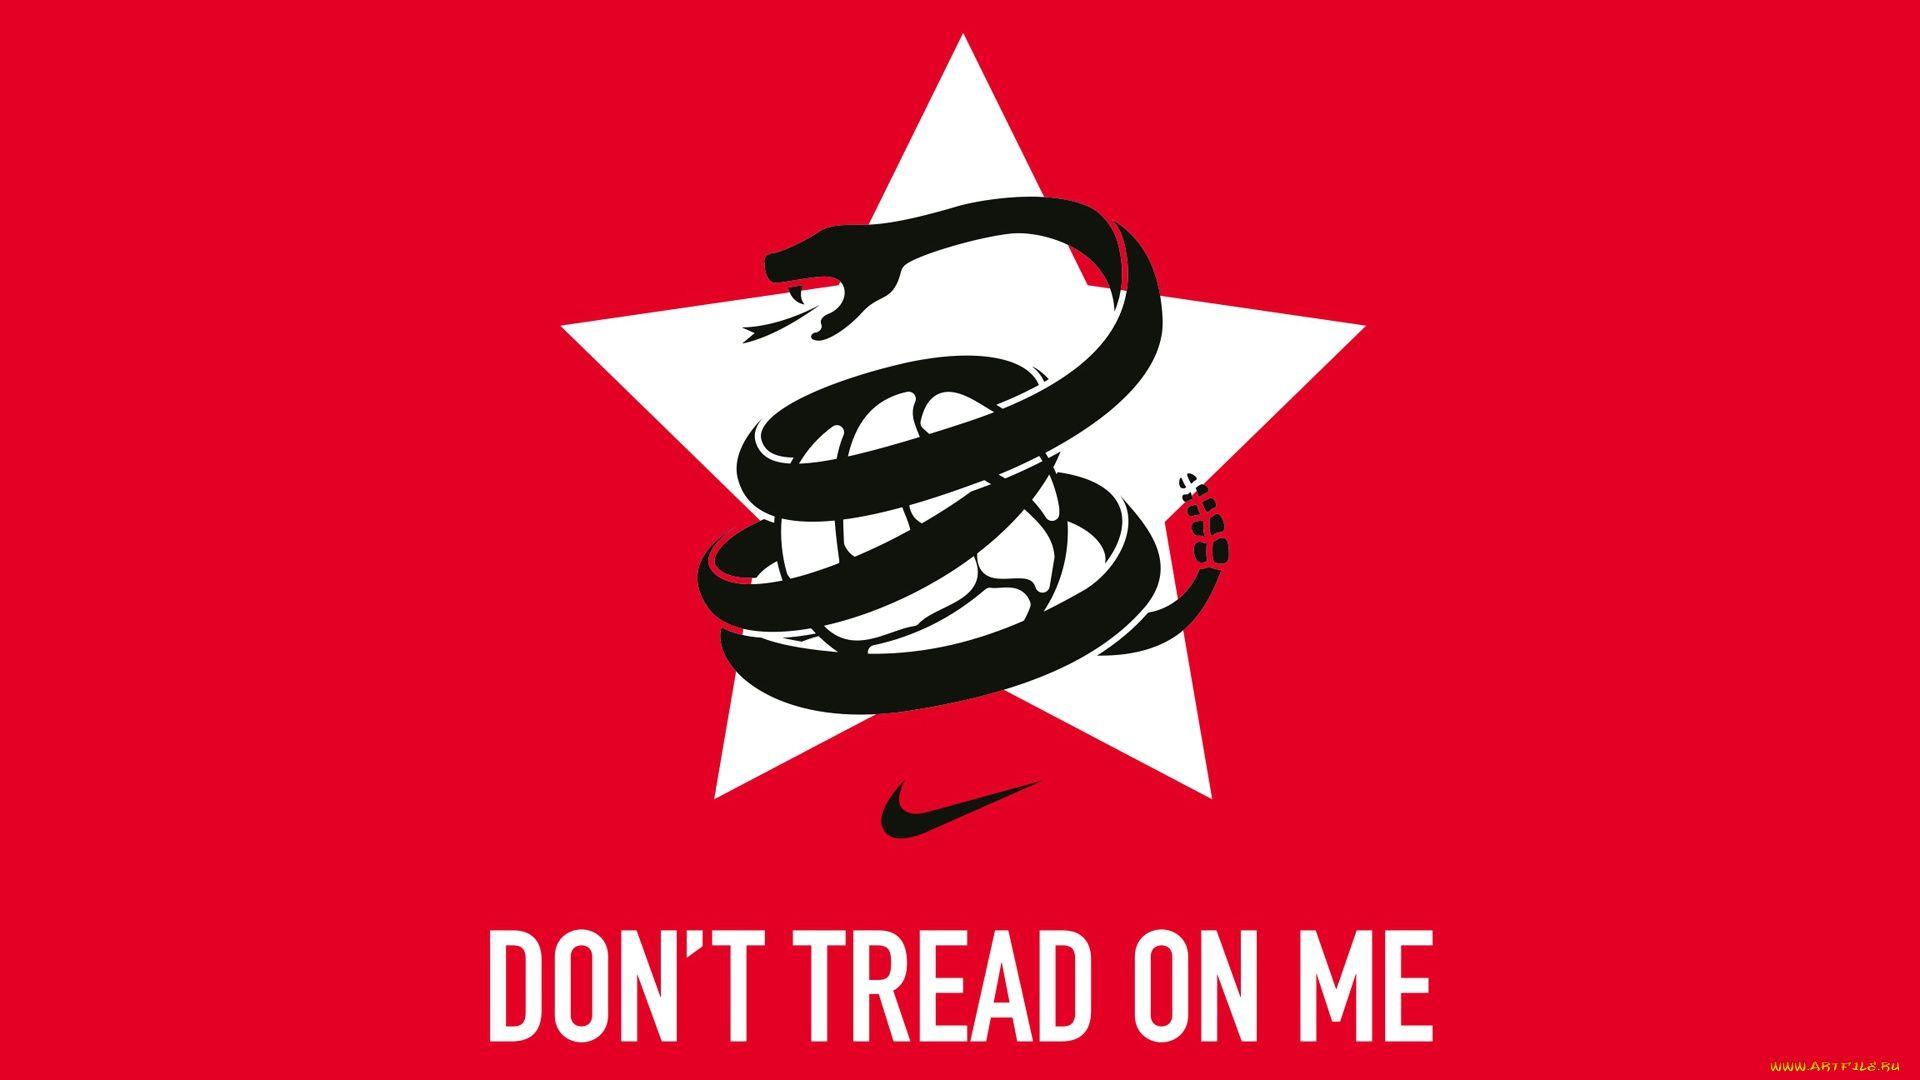 Brands, Nike Slogan, Nike, Ball, Star, Snake